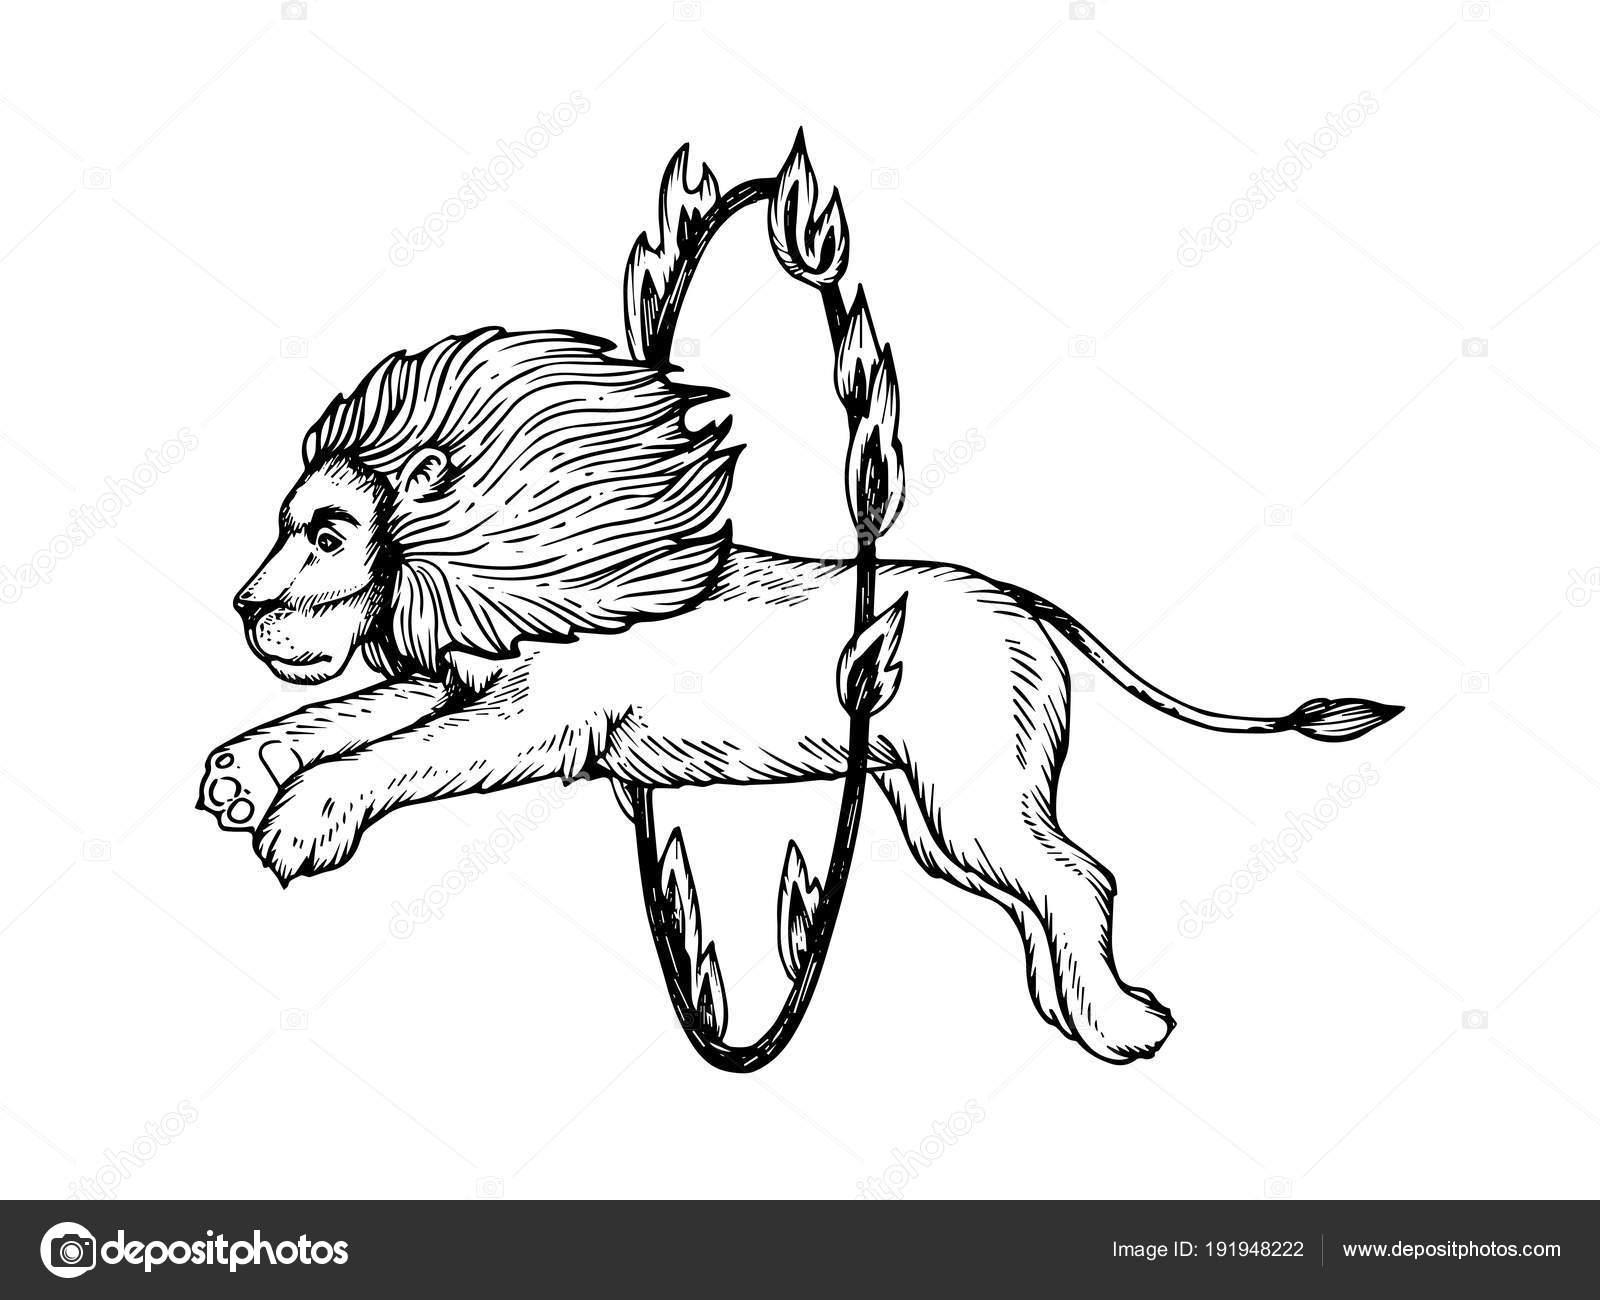 León de circo salta al vector de grabado de anillo de fuego — Vector ...